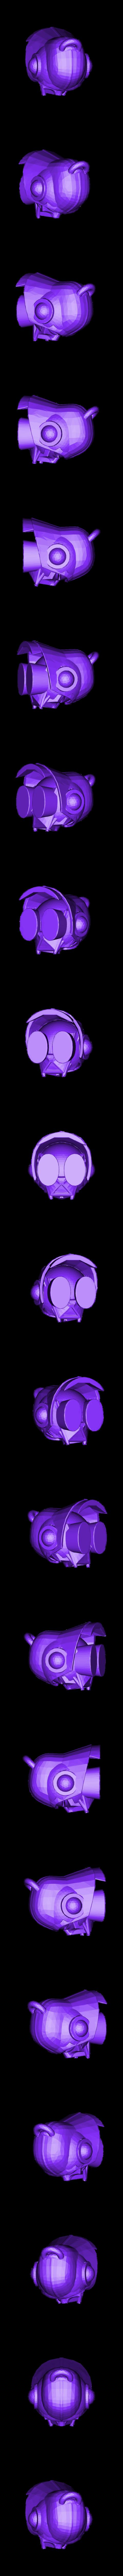 Darth_Marvin.stl Download free STL file 3DHubs Wars playset • 3D printable design, FABtotum